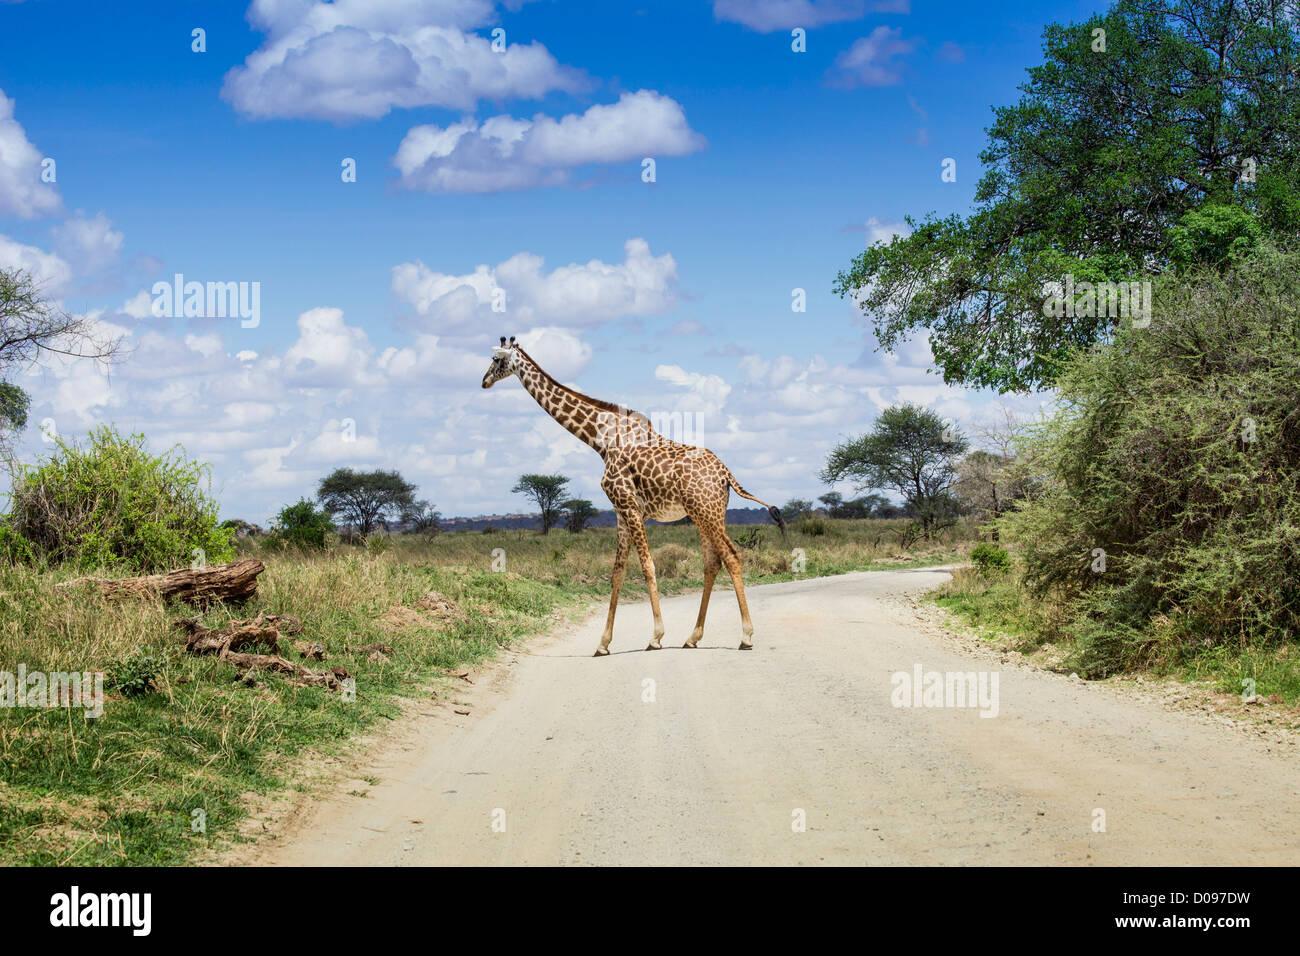 Giraffe in Tarangire National Park, Tanzania, Africa - Stock Image